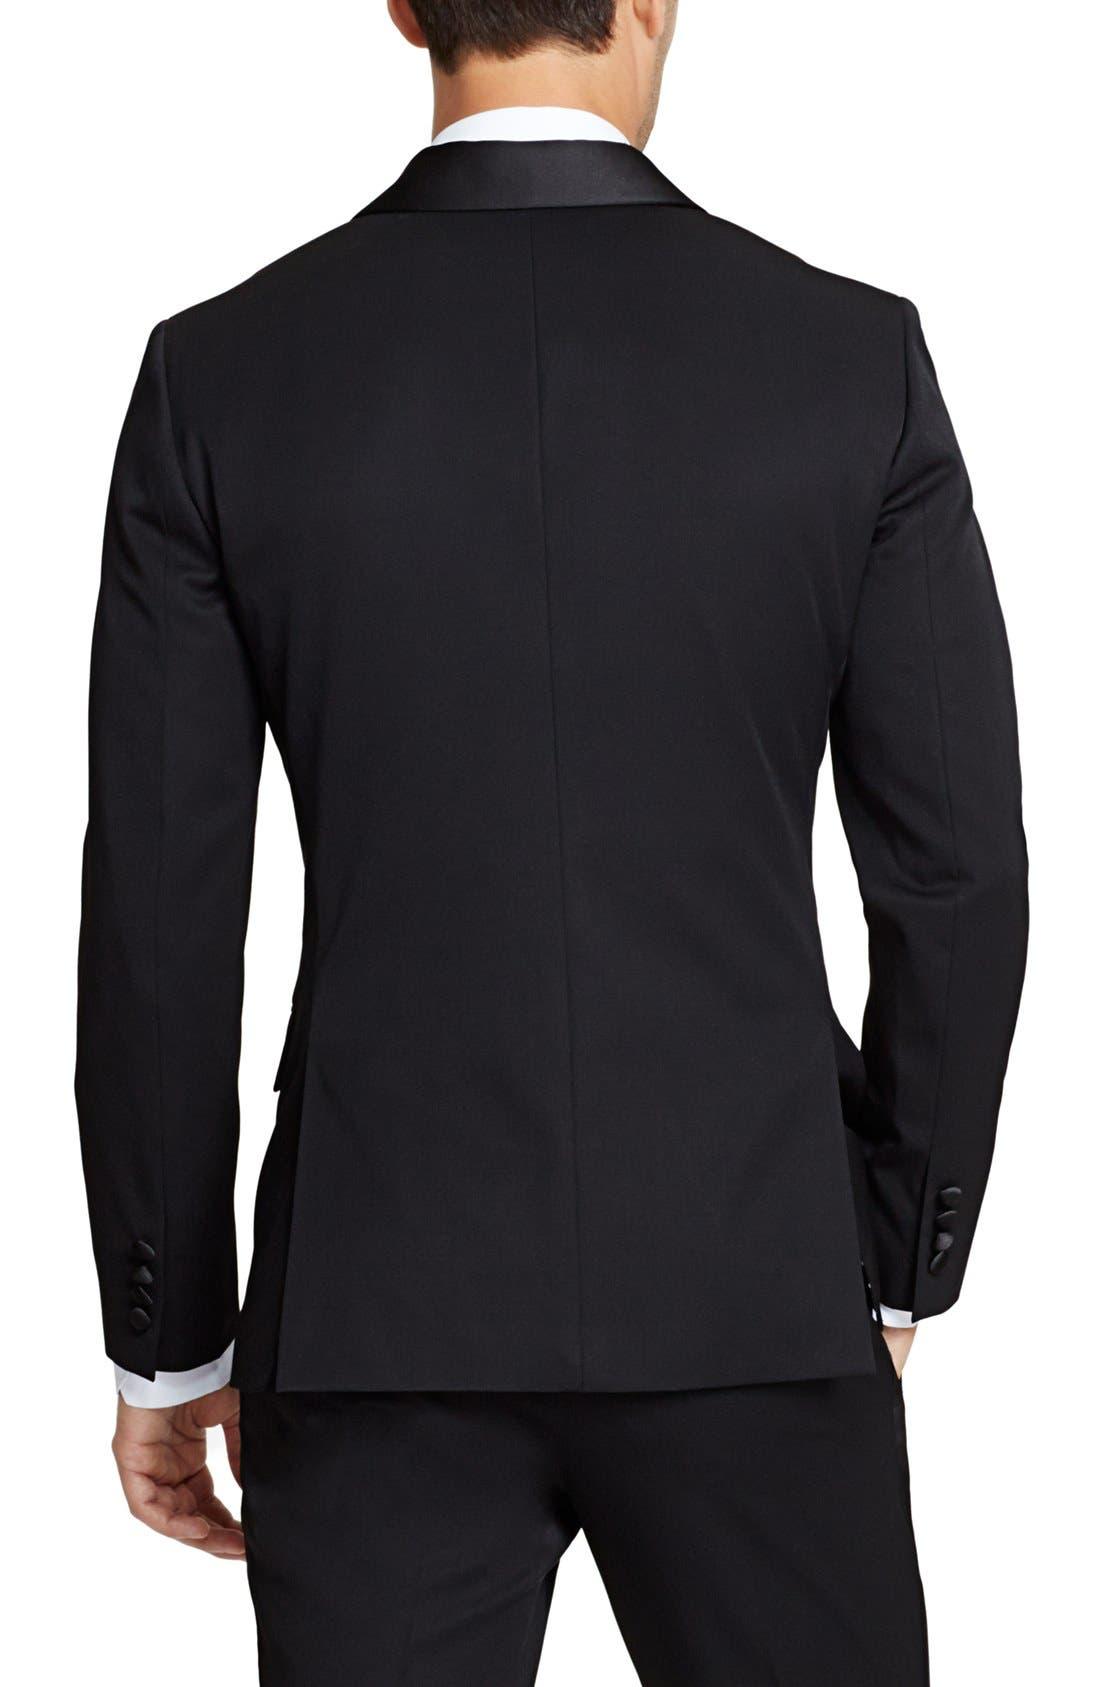 BONOBOS,                             Trim Fit Wool Dinner Jacket,                             Alternate thumbnail 4, color,                             BLACK